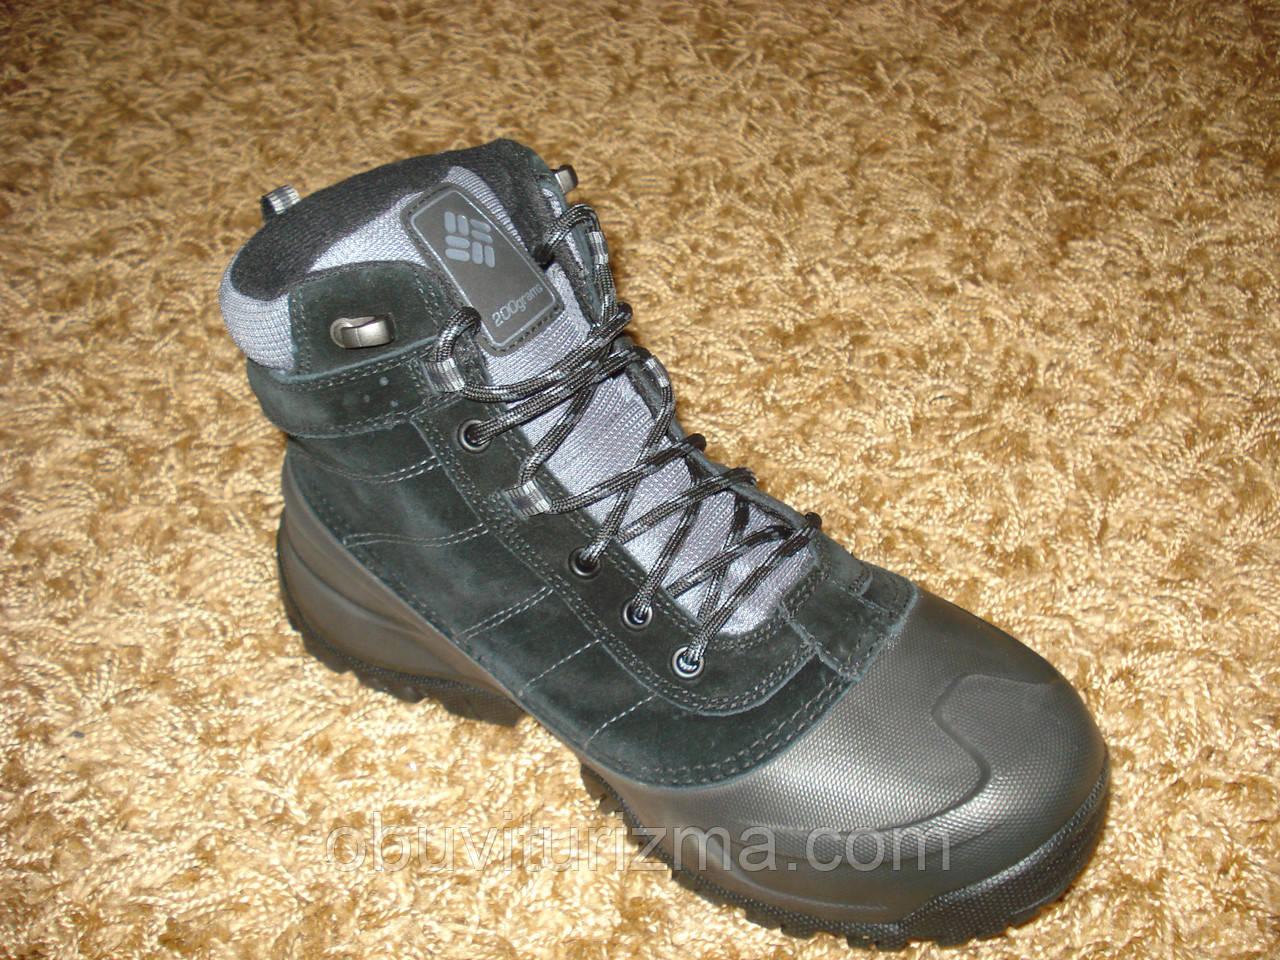 Супер обувь Columbia® (легкая и теплая ) 200-gram Thinsulate (13 ... e5d3e6bca7b5d